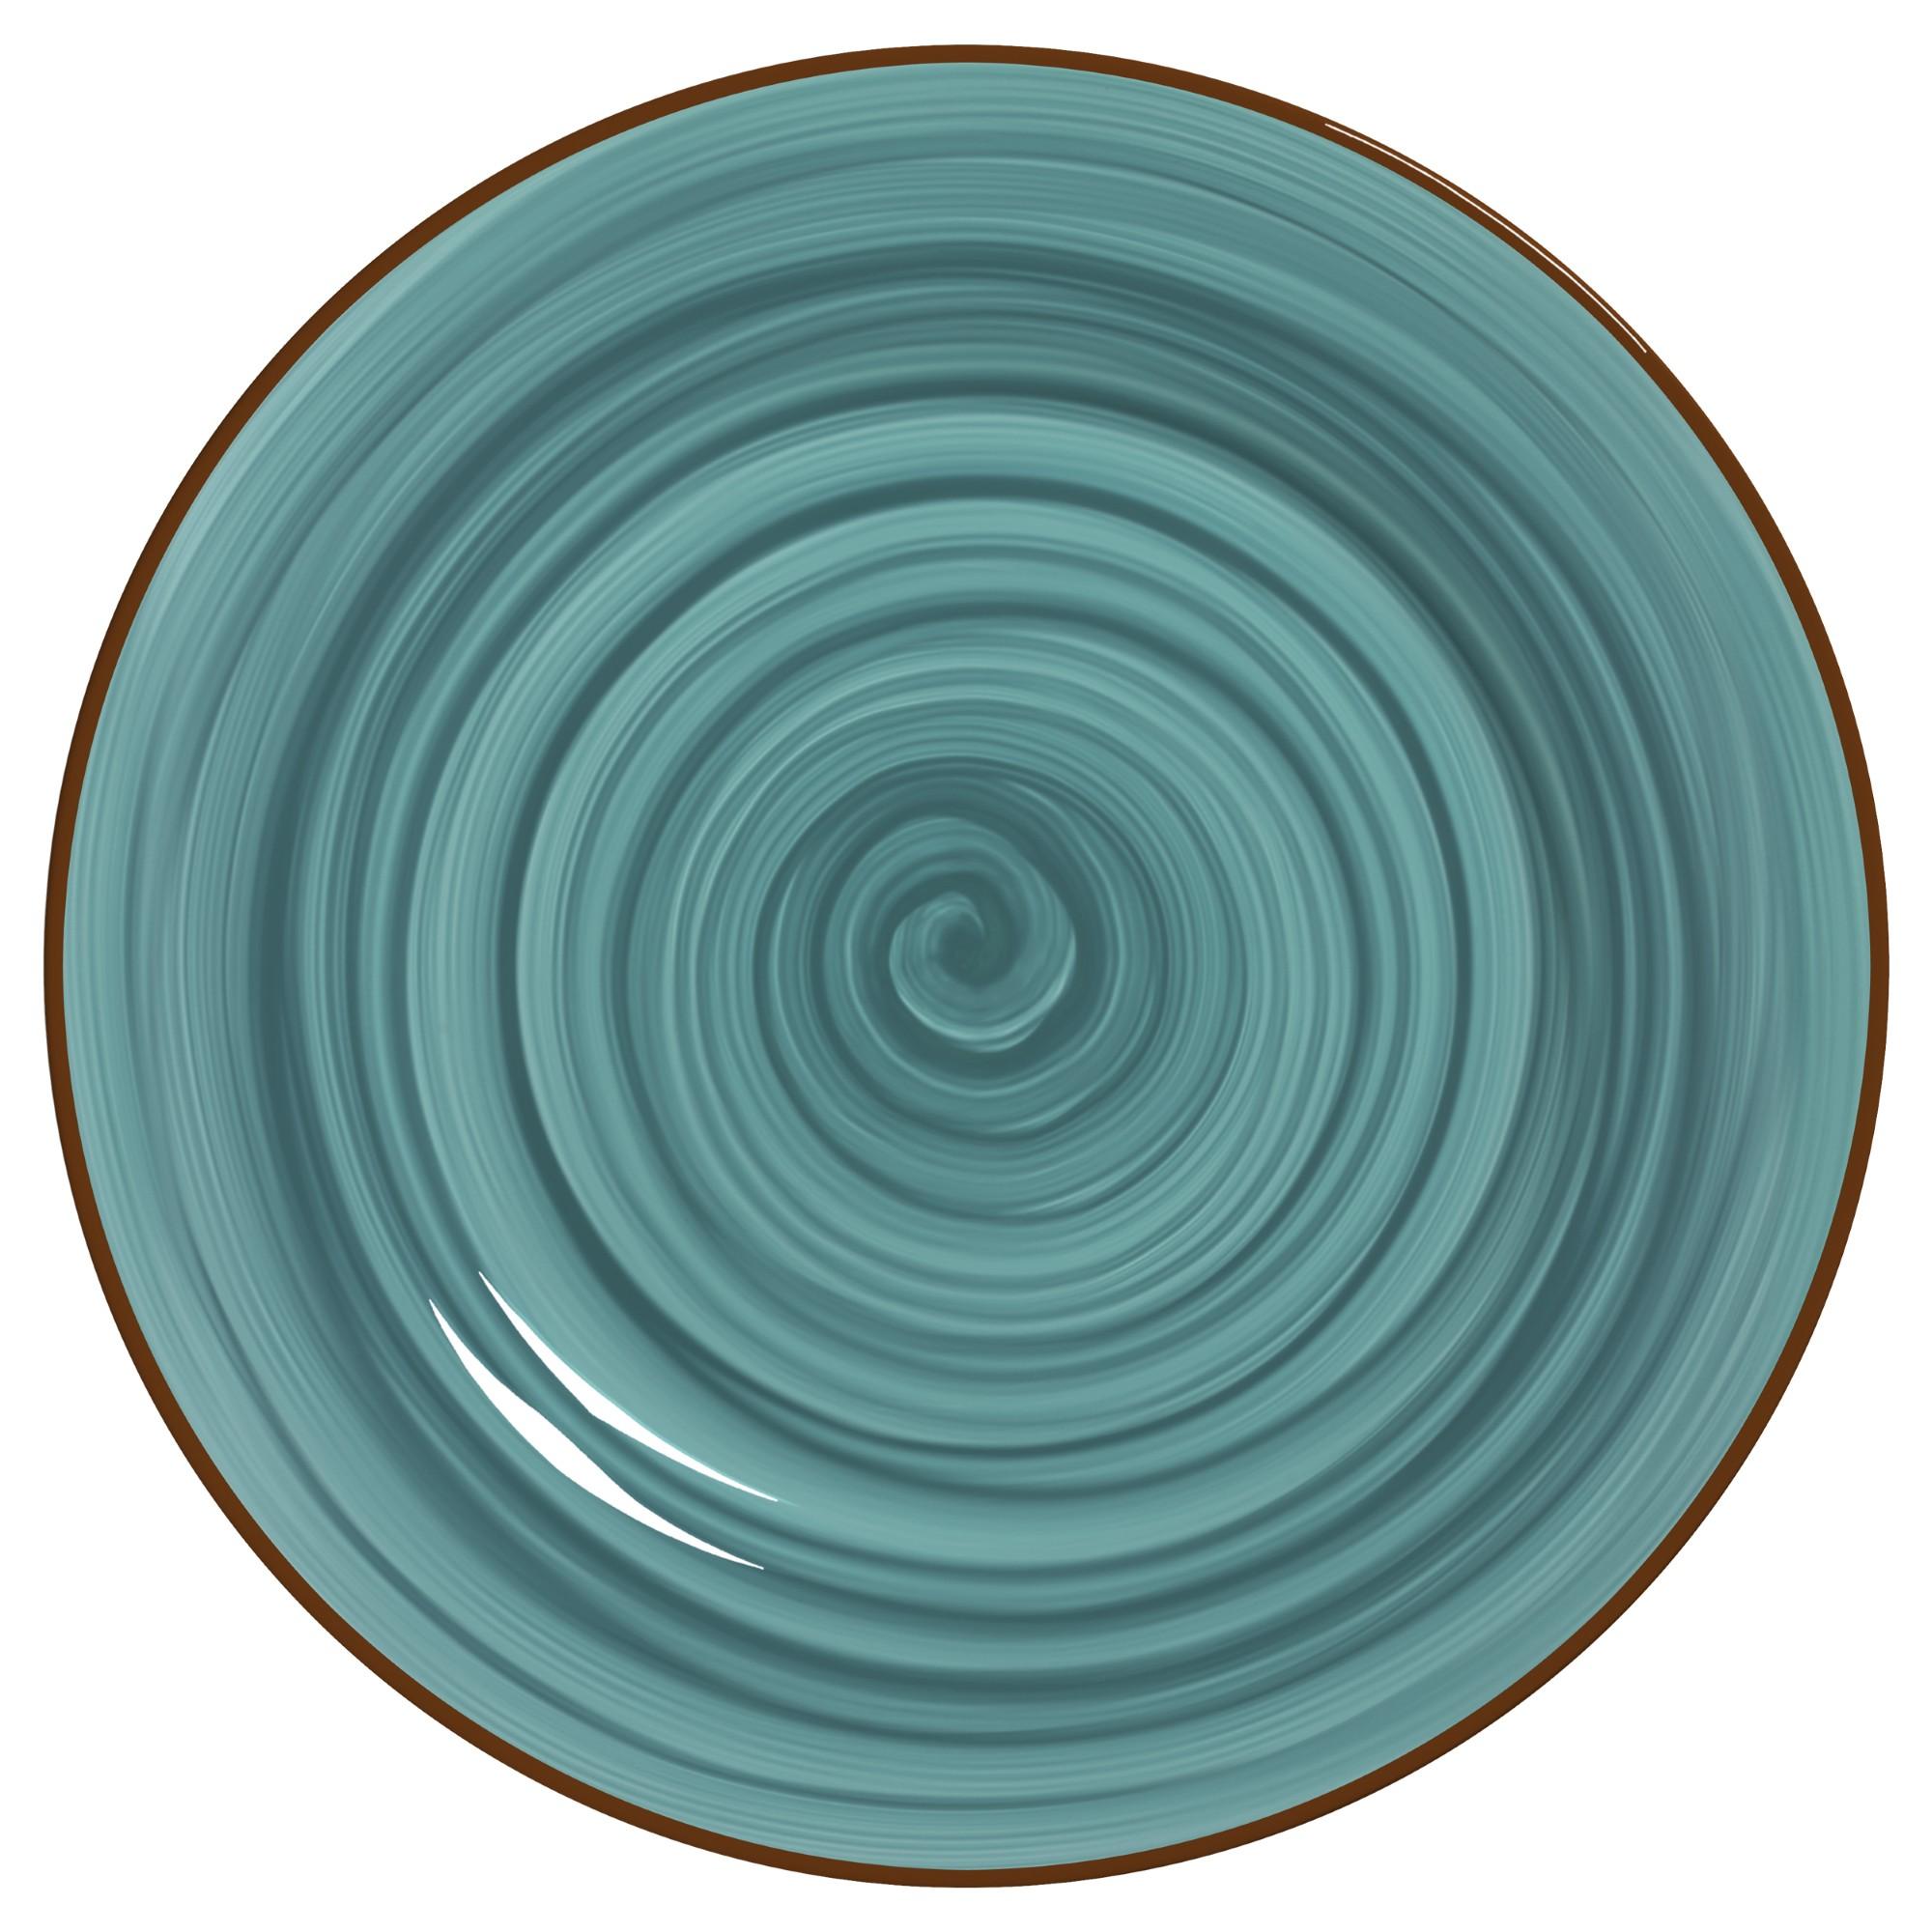 Prato Raso Redondo em Ceramica Celeste 28cm - Alleanza